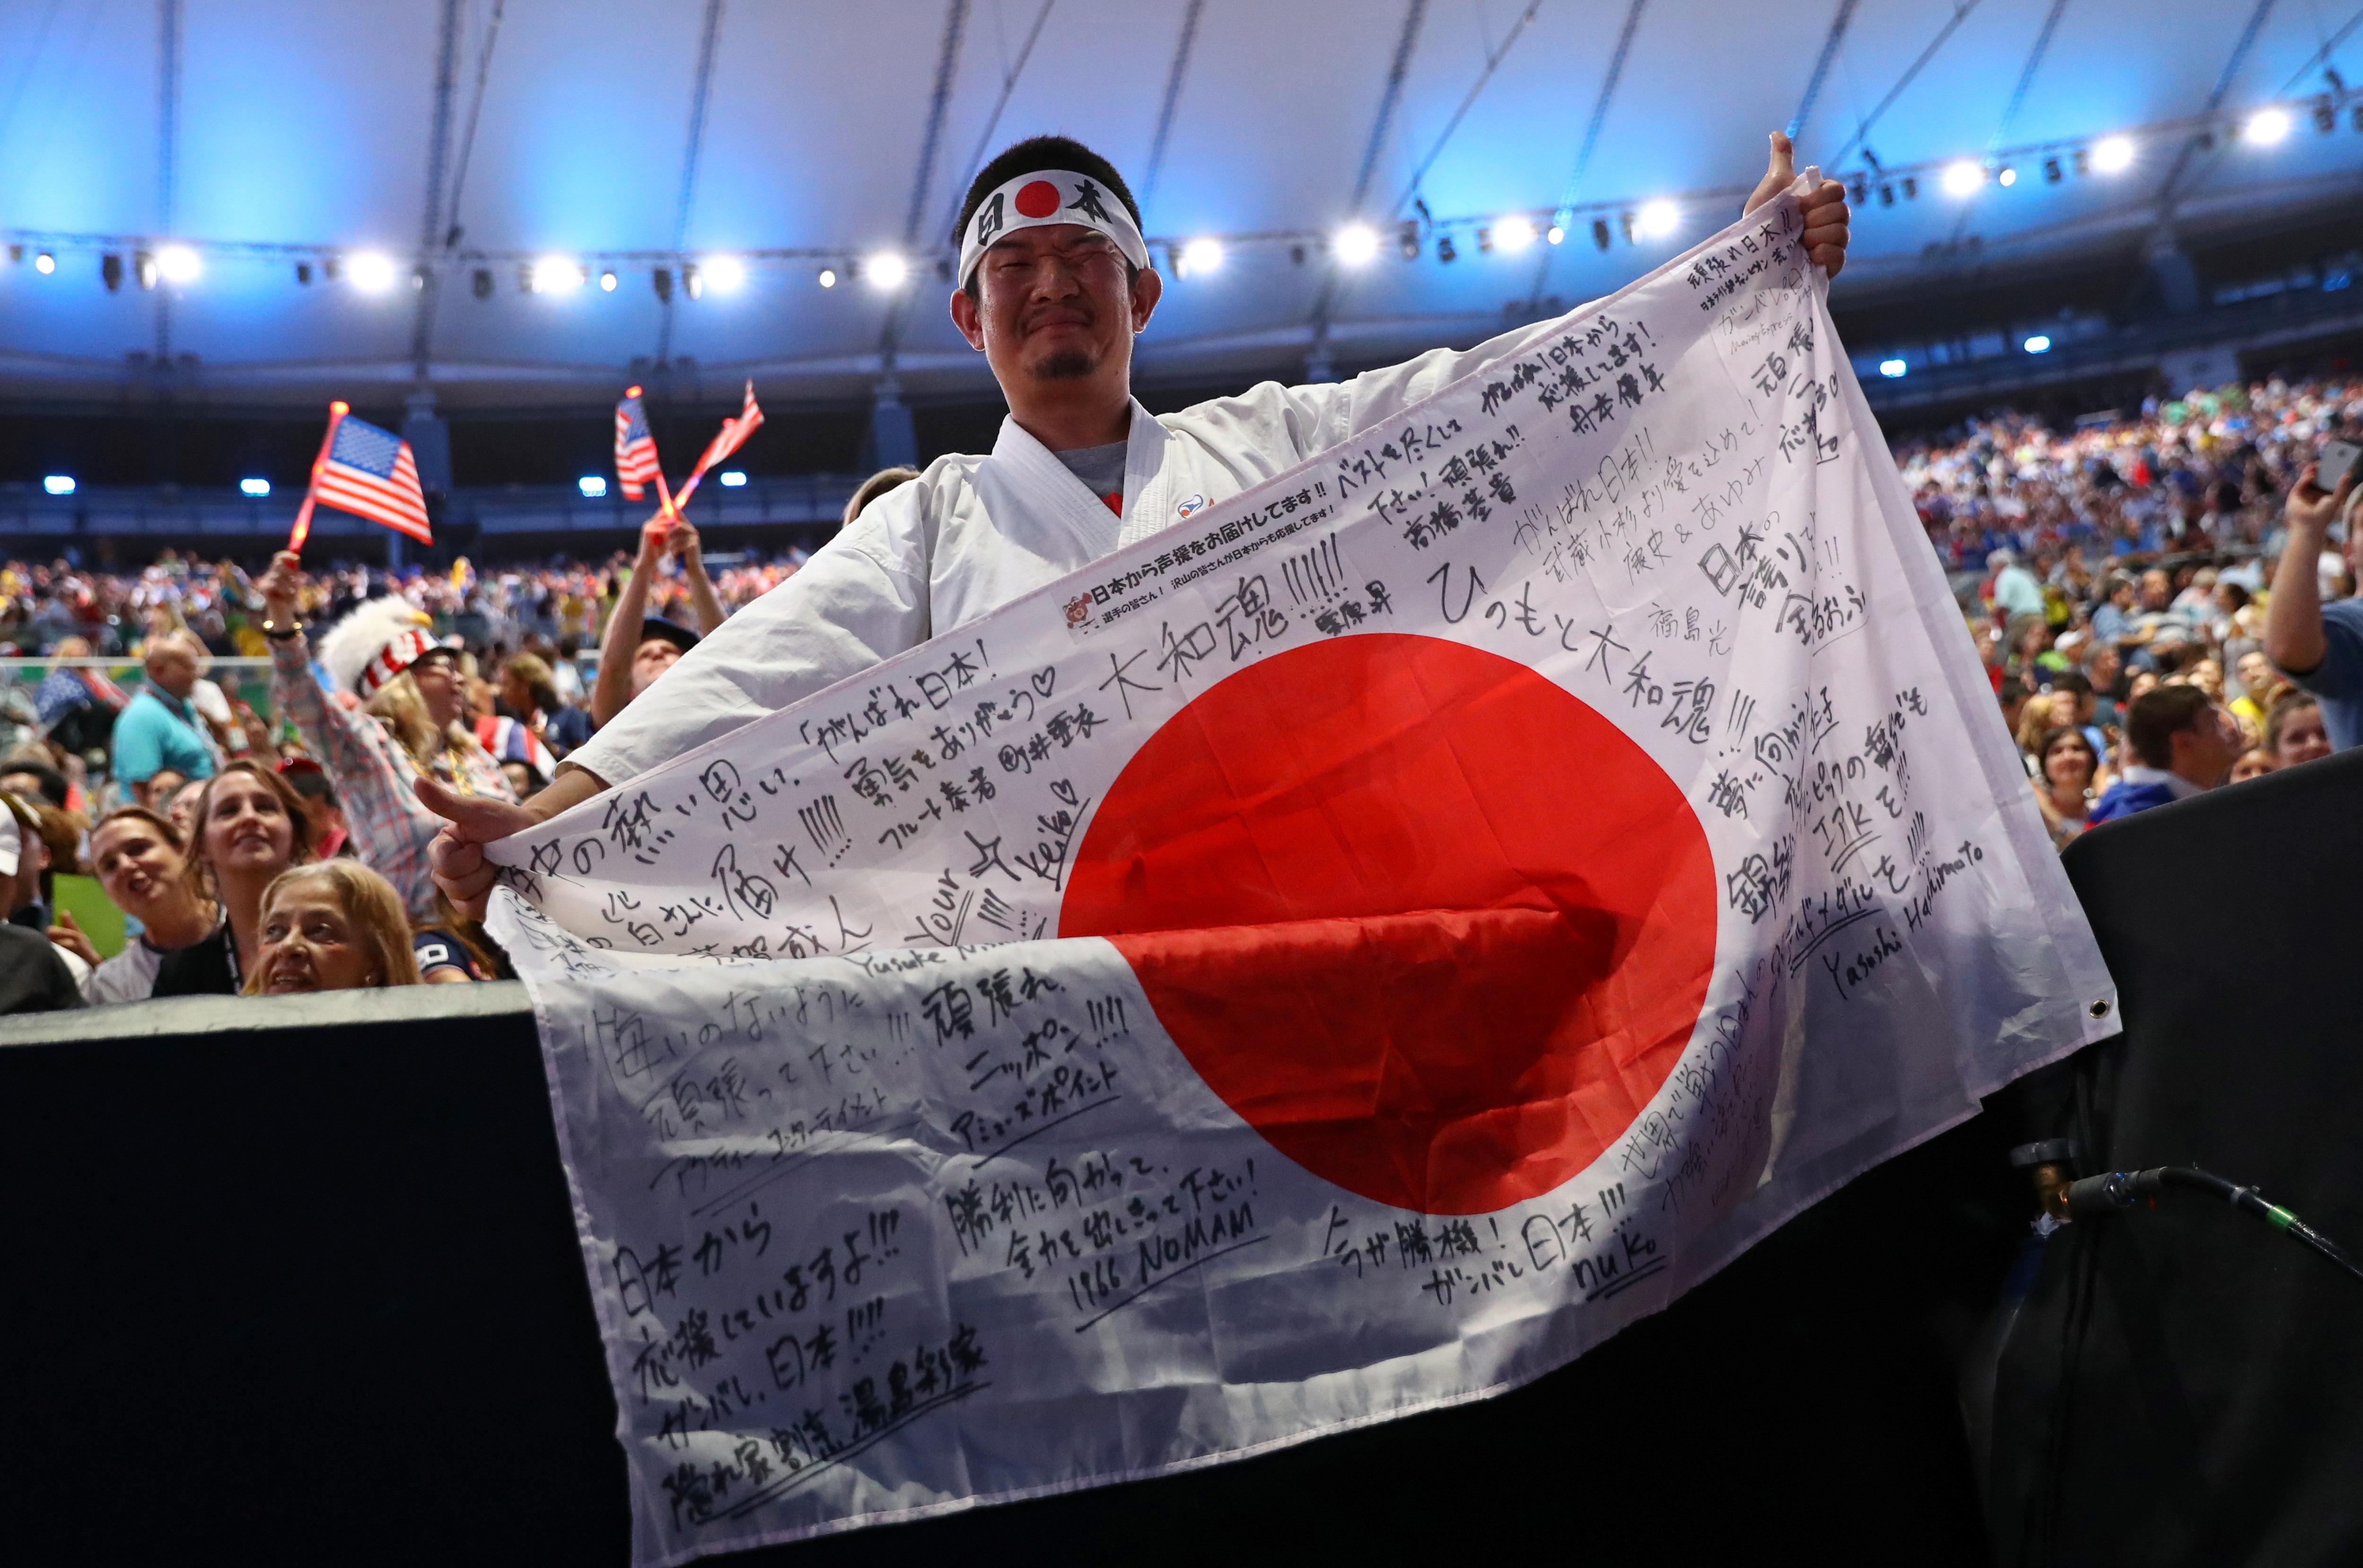 Kazunori Takishima is pictured before the opening ceremony of the Rio 2016 Olympic Games in Rio de Janeiro, Brazil, August 5, 2016. REUTERS/Kai Pfaffenbach